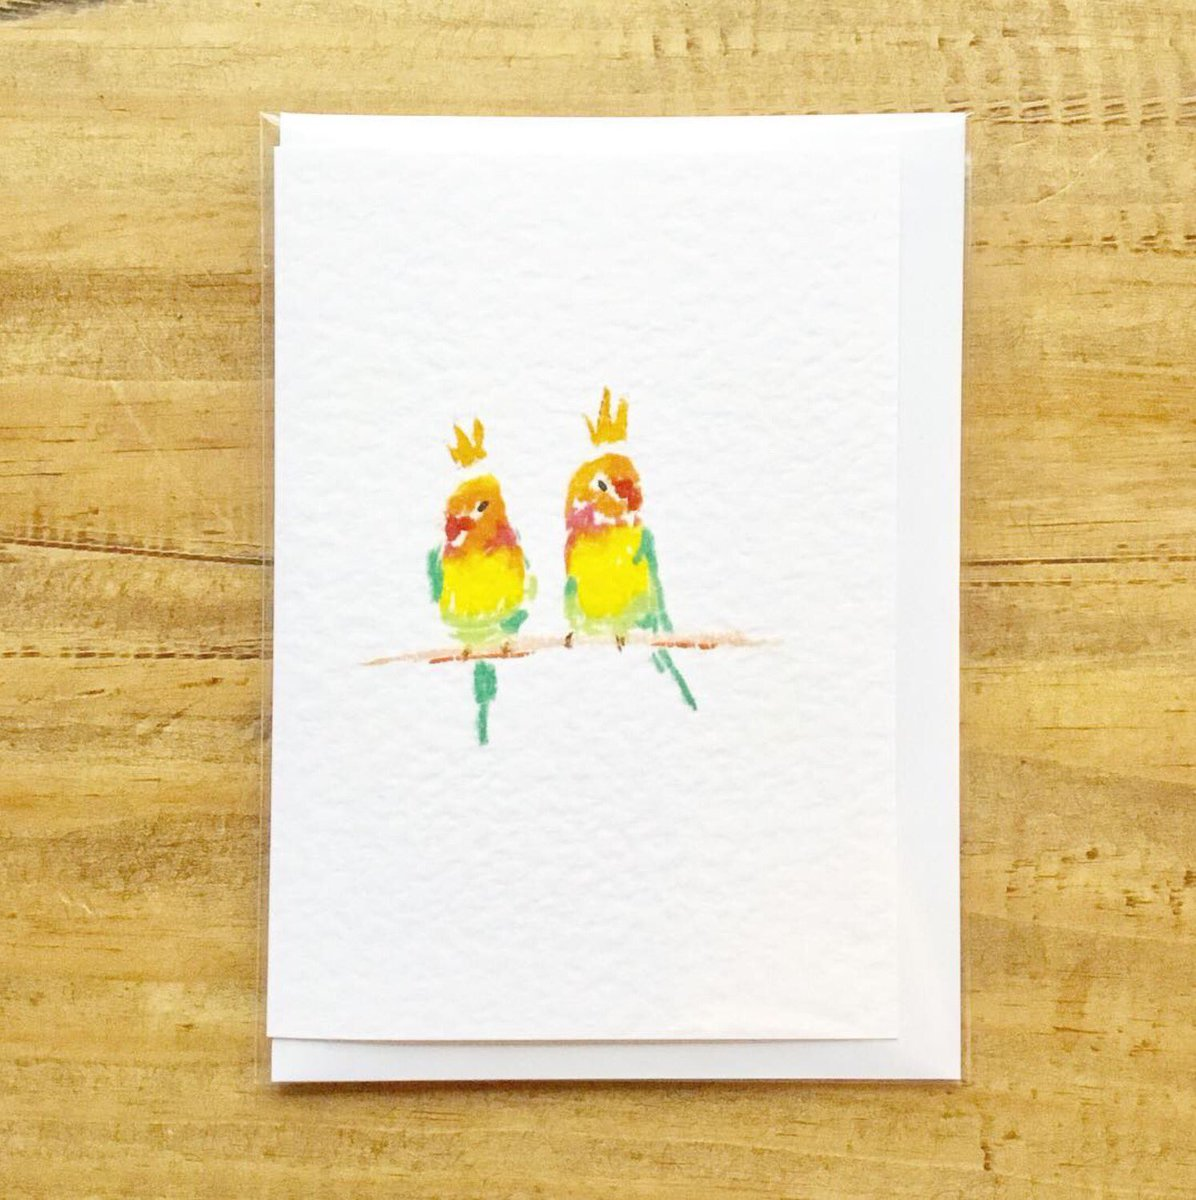 Tuesday.Tweetings #tropicalbirds #greetingcards #etsyseller #pollyrosedesigns #illustration #homemade #handmadeisbetter #madeinengland<br>http://pic.twitter.com/MIdTA9ANIT